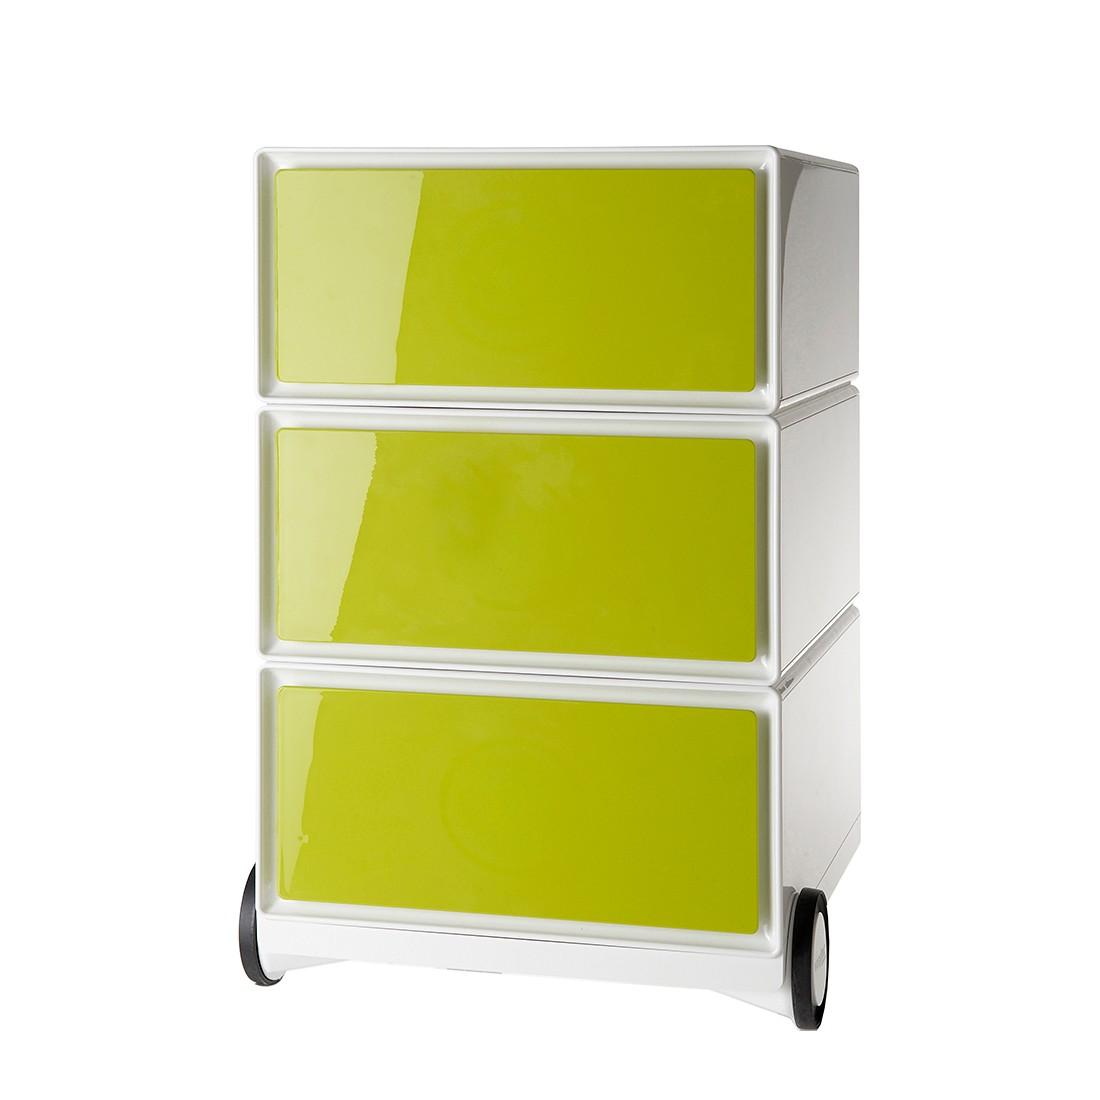 Rollende kast easyBox I - Wit/groen, easy Office und Paperflow